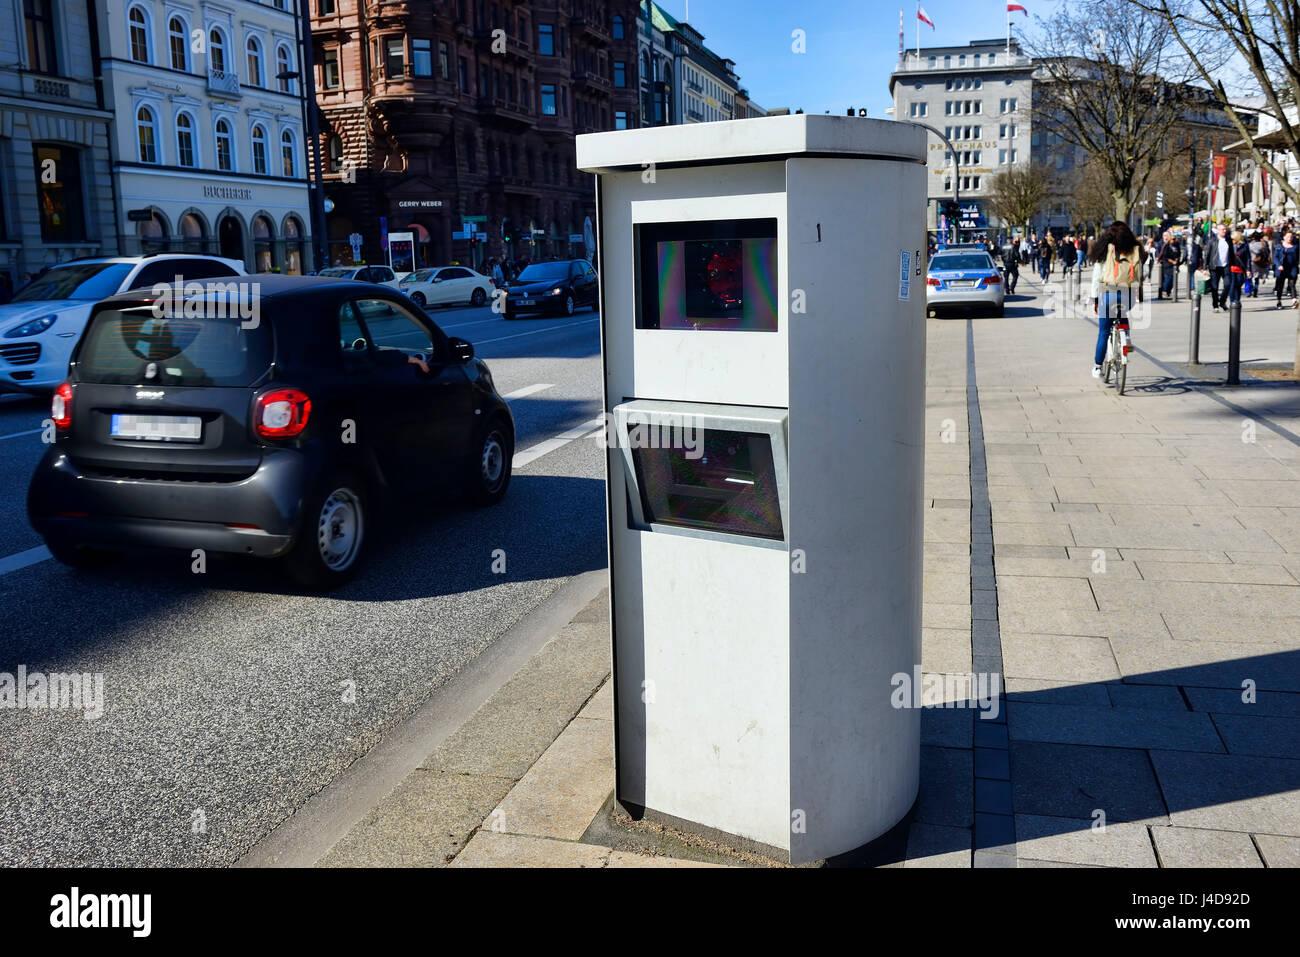 Stationary radar device in the Jungfernstieg in Hamburg, Germany, Europe, Stationaeres Radargeraet am Jungfernstieg - Stock Image